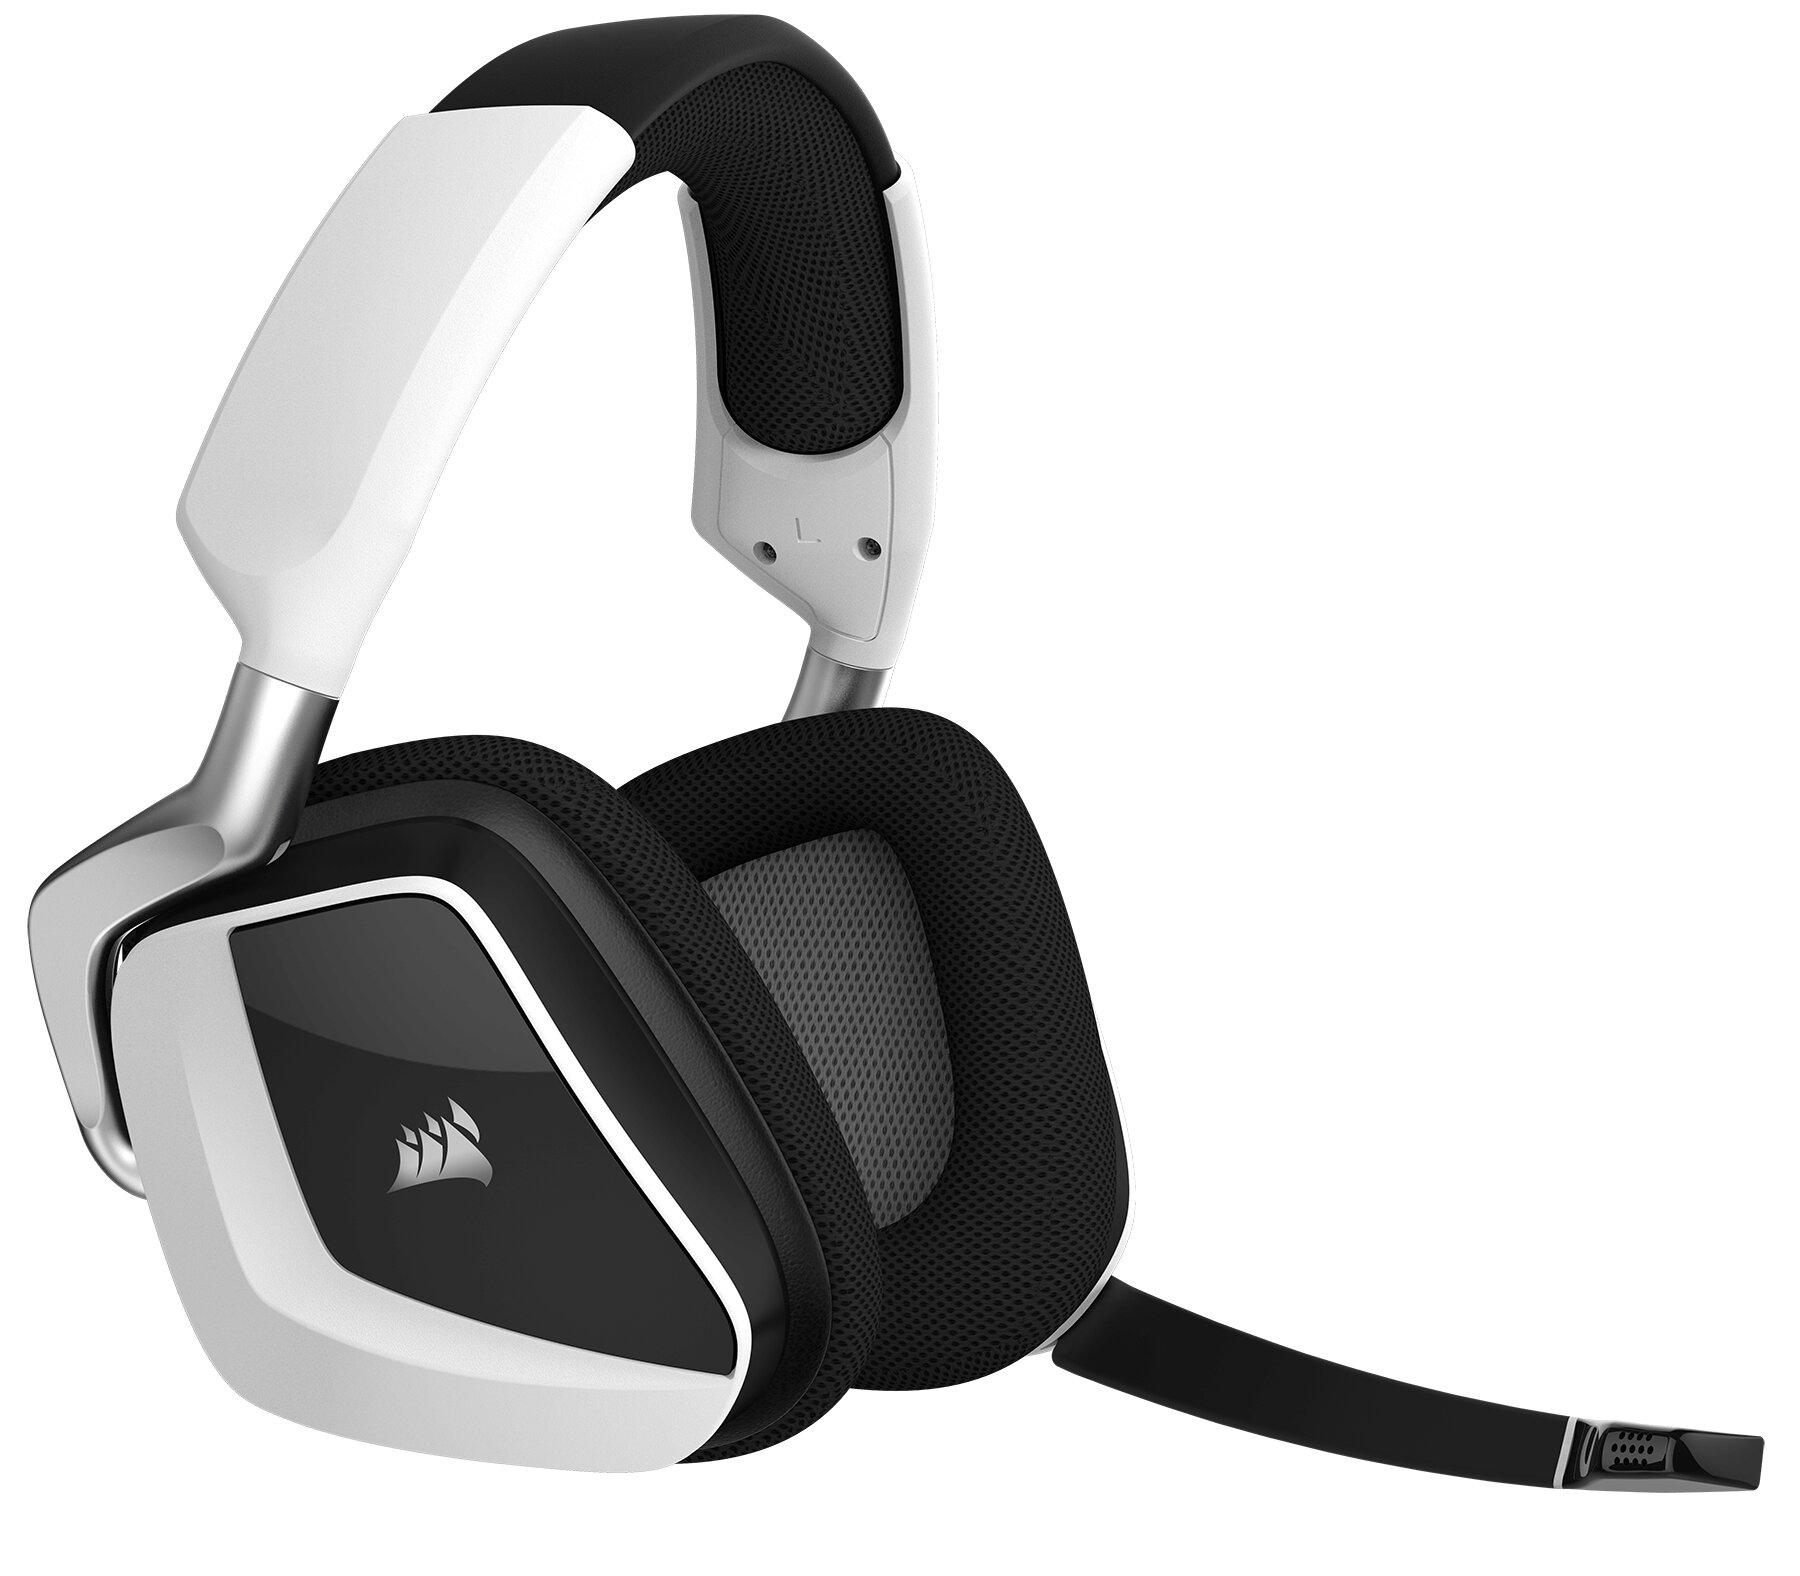 Tai nghe - Headphone Corsair Void Pro RGB Wireless